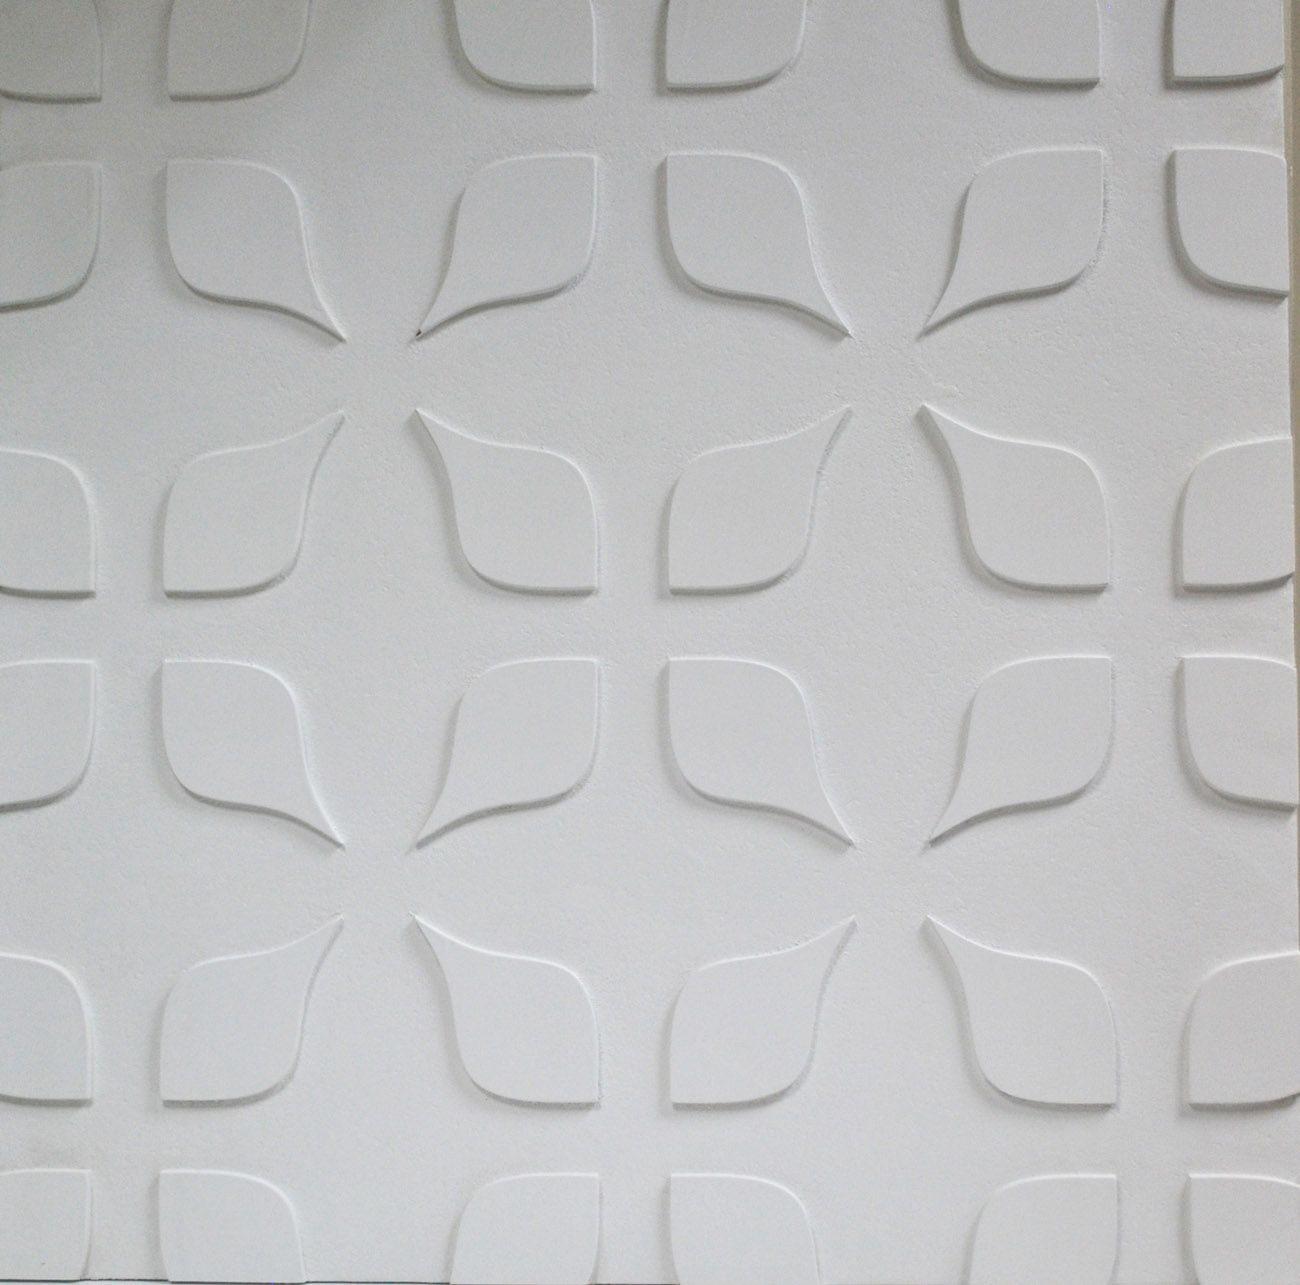 How To Cut Decorative Tile 3D Wall Dubai Cnc Cutting Dubai 3D Wall Panels Dubai Decorative